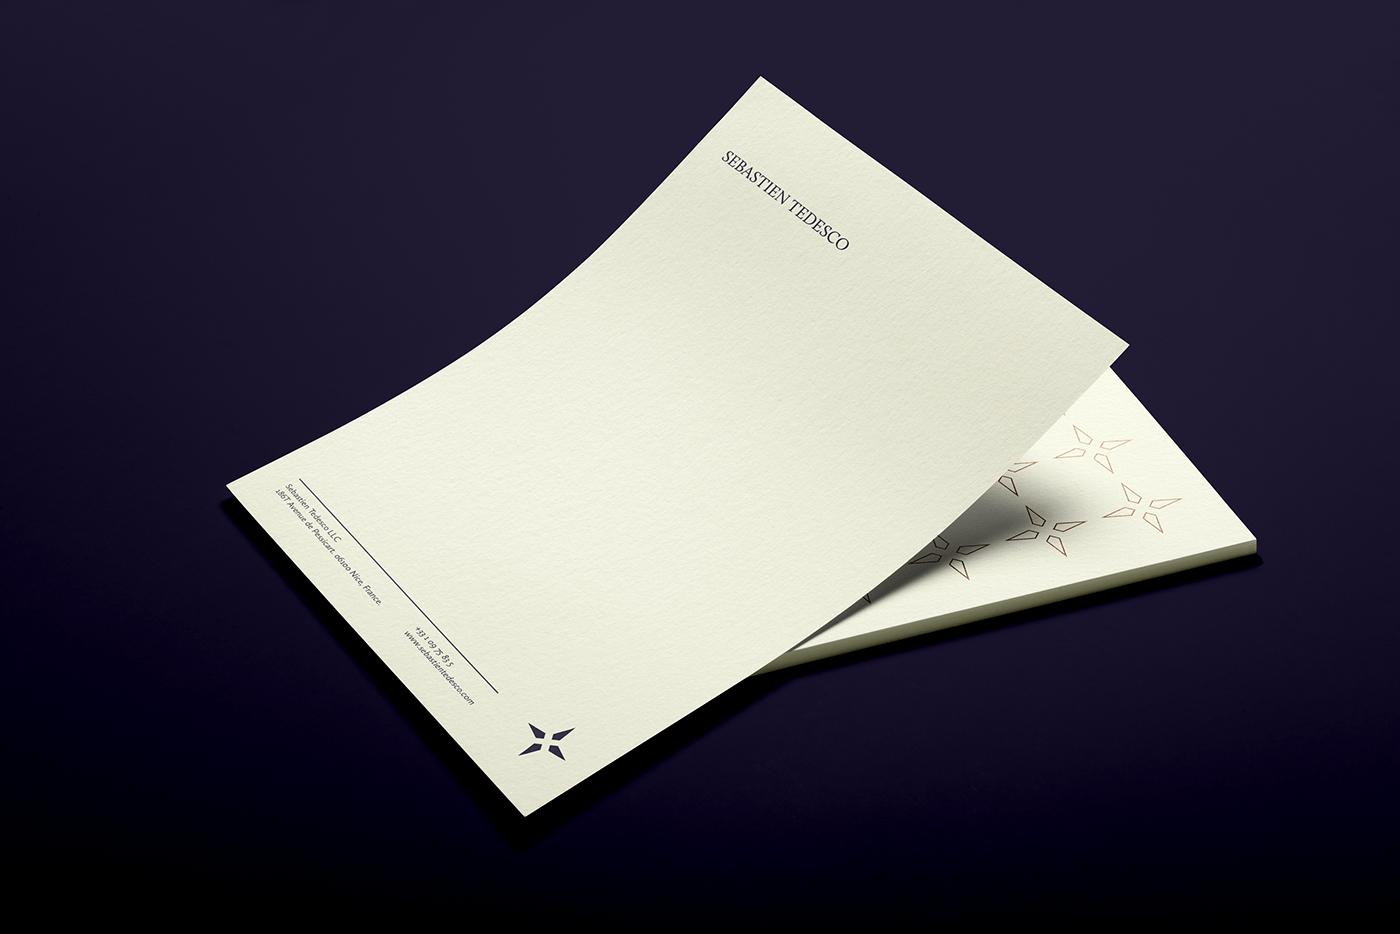 sebastien tedesco letterhead design